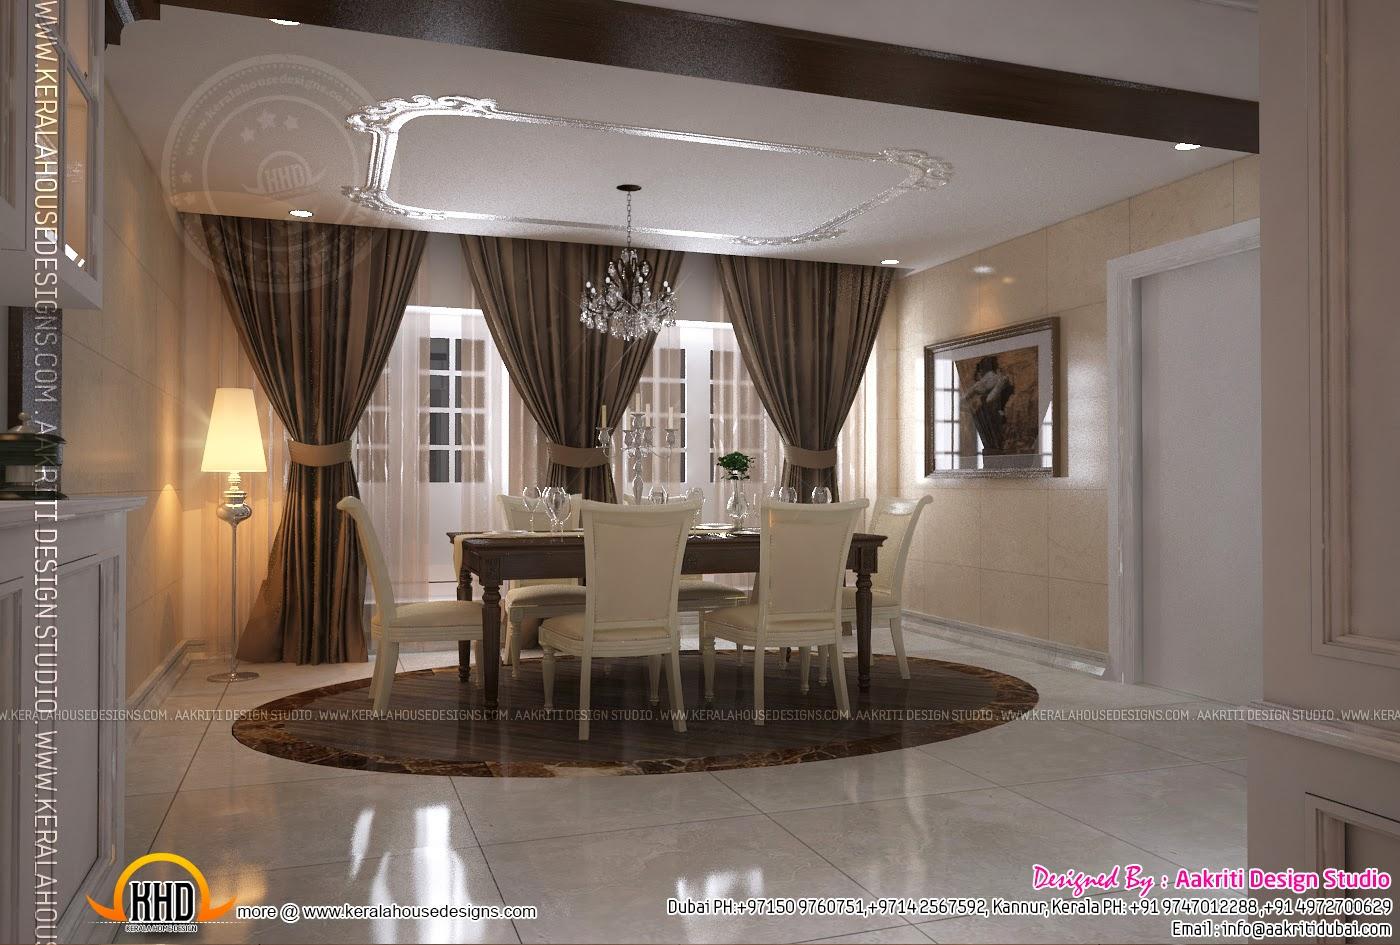 Best Kitchen Gallery: Interior Design Of Living Room Dining Room And Kitchen Indian of Indian Home Dining Room Design on rachelxblog.com